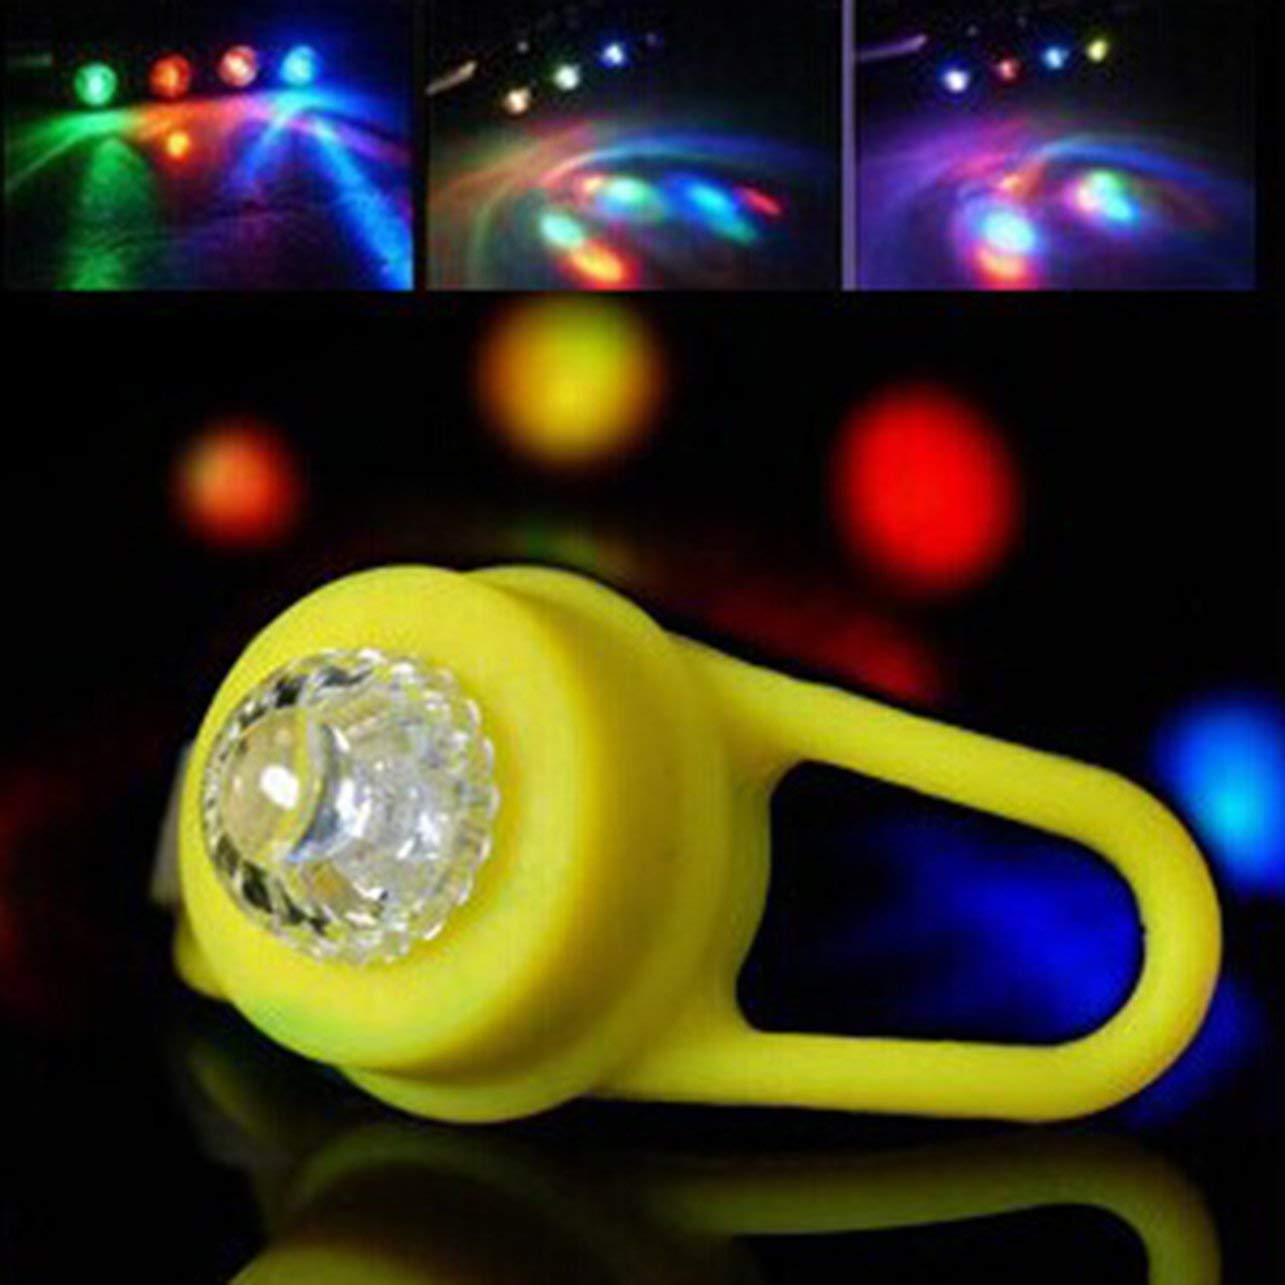 WOSOSYEYO Bicicleta Luz de Advertencia Colorida Luz de Cola de Silicona Bicicleta Luces de Colores